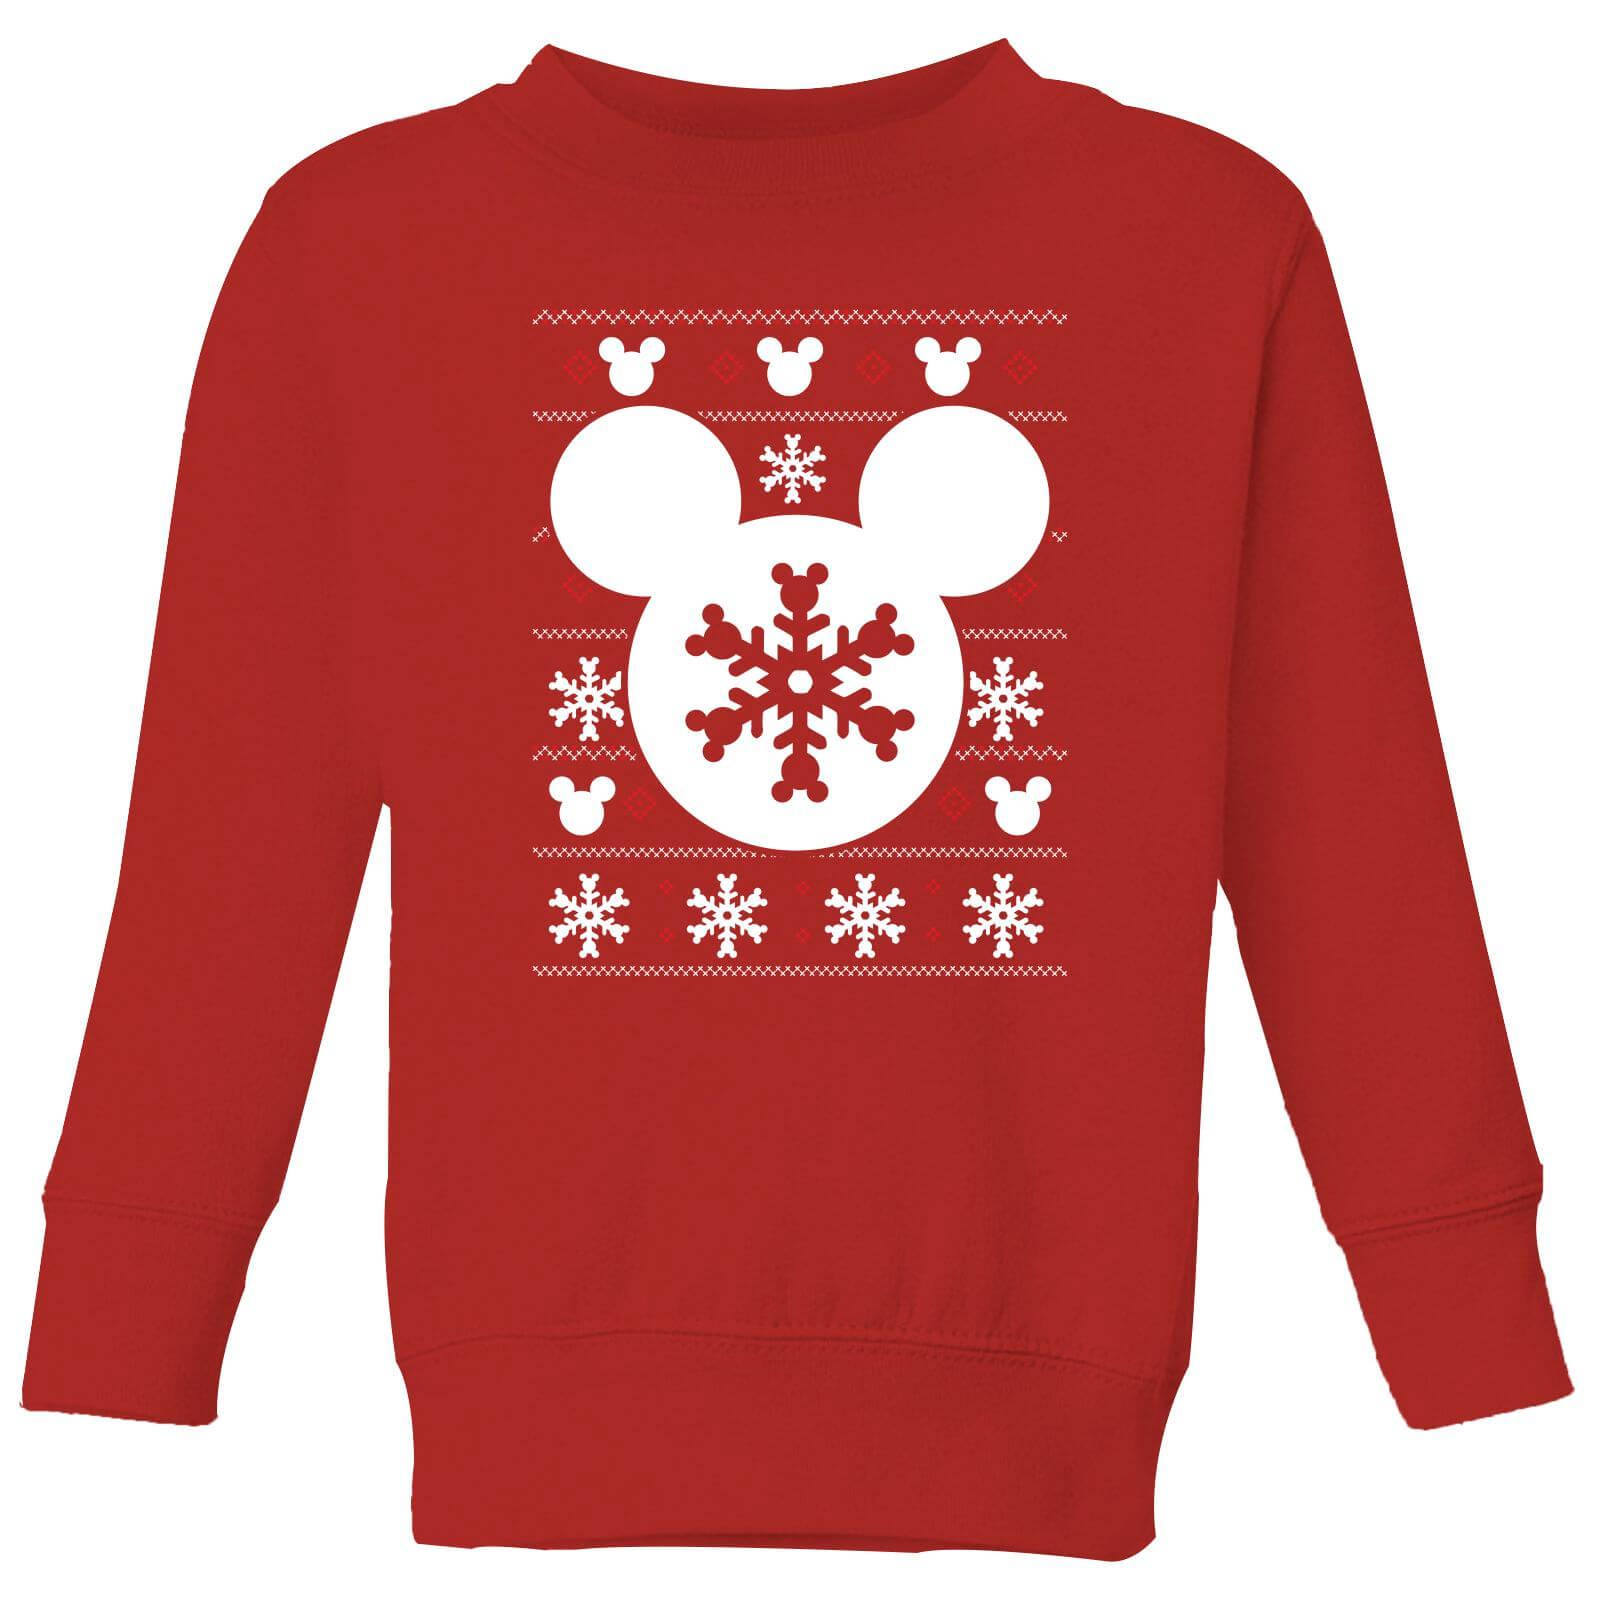 Disney Snowflake Silhouette Kids Christmas Sweatshirt Red Clothing Zavvi Uk